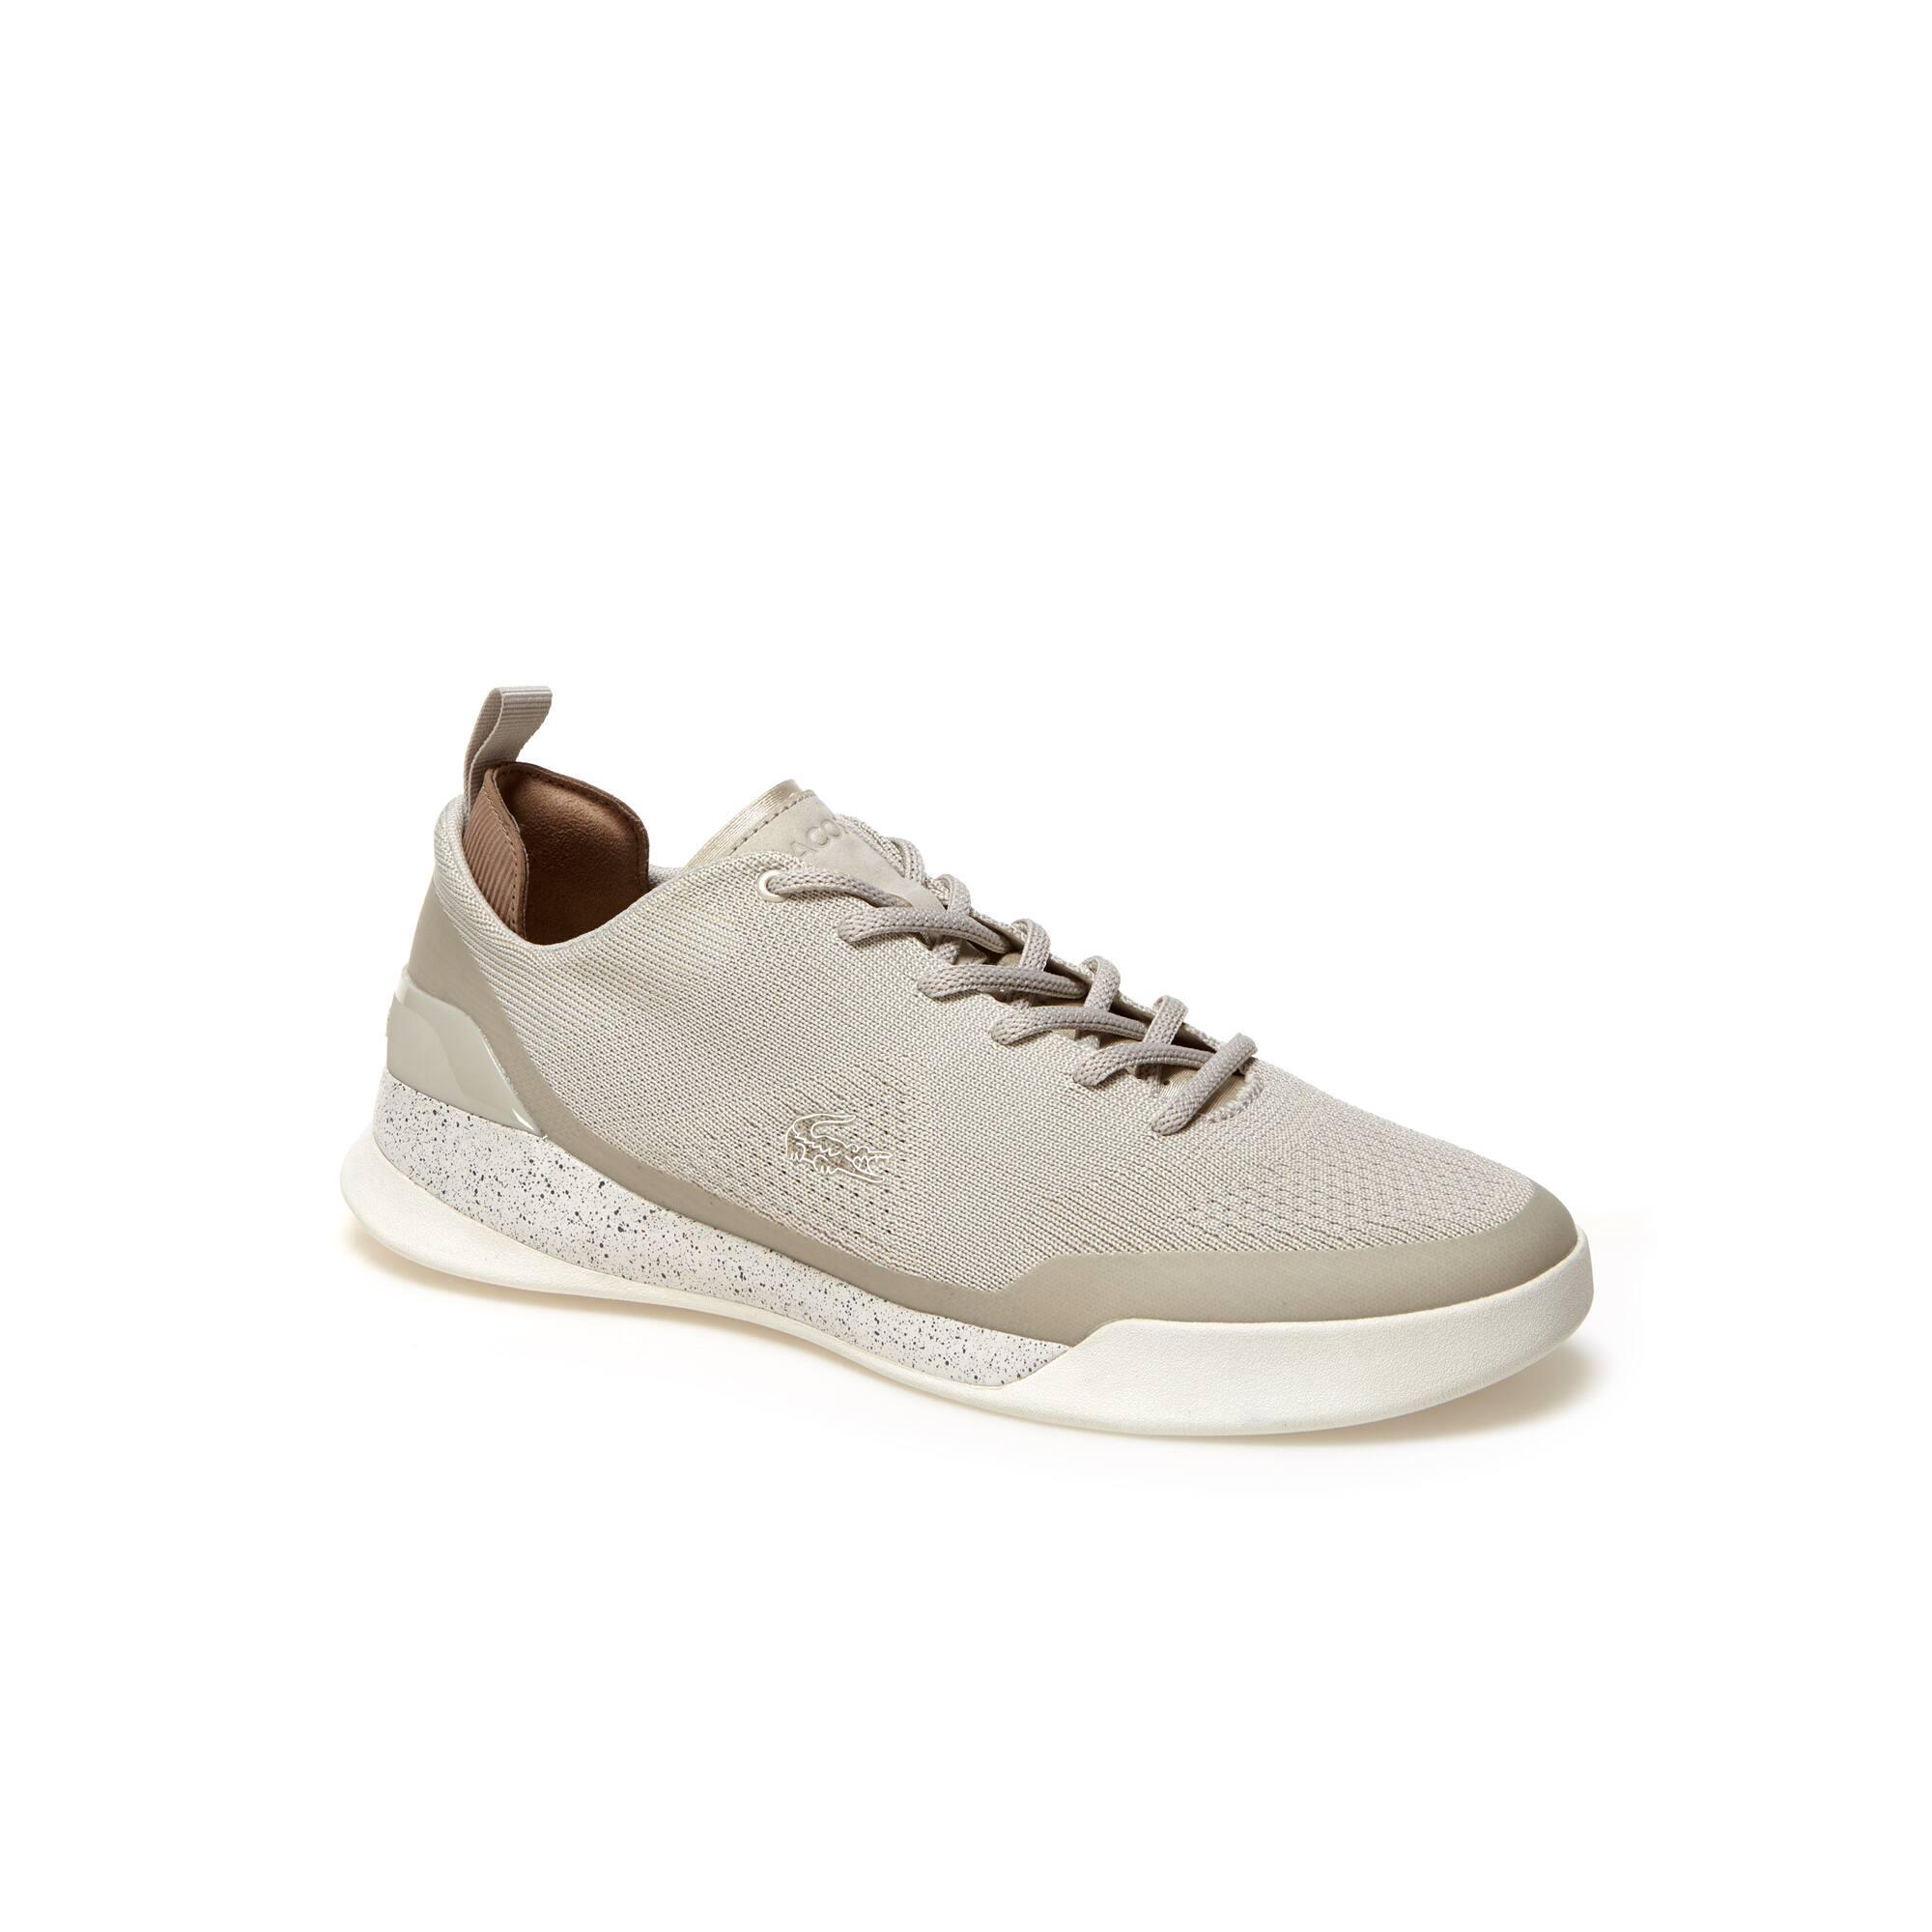 Herren-Sneakers LT DUAL ELITE aus Stoff